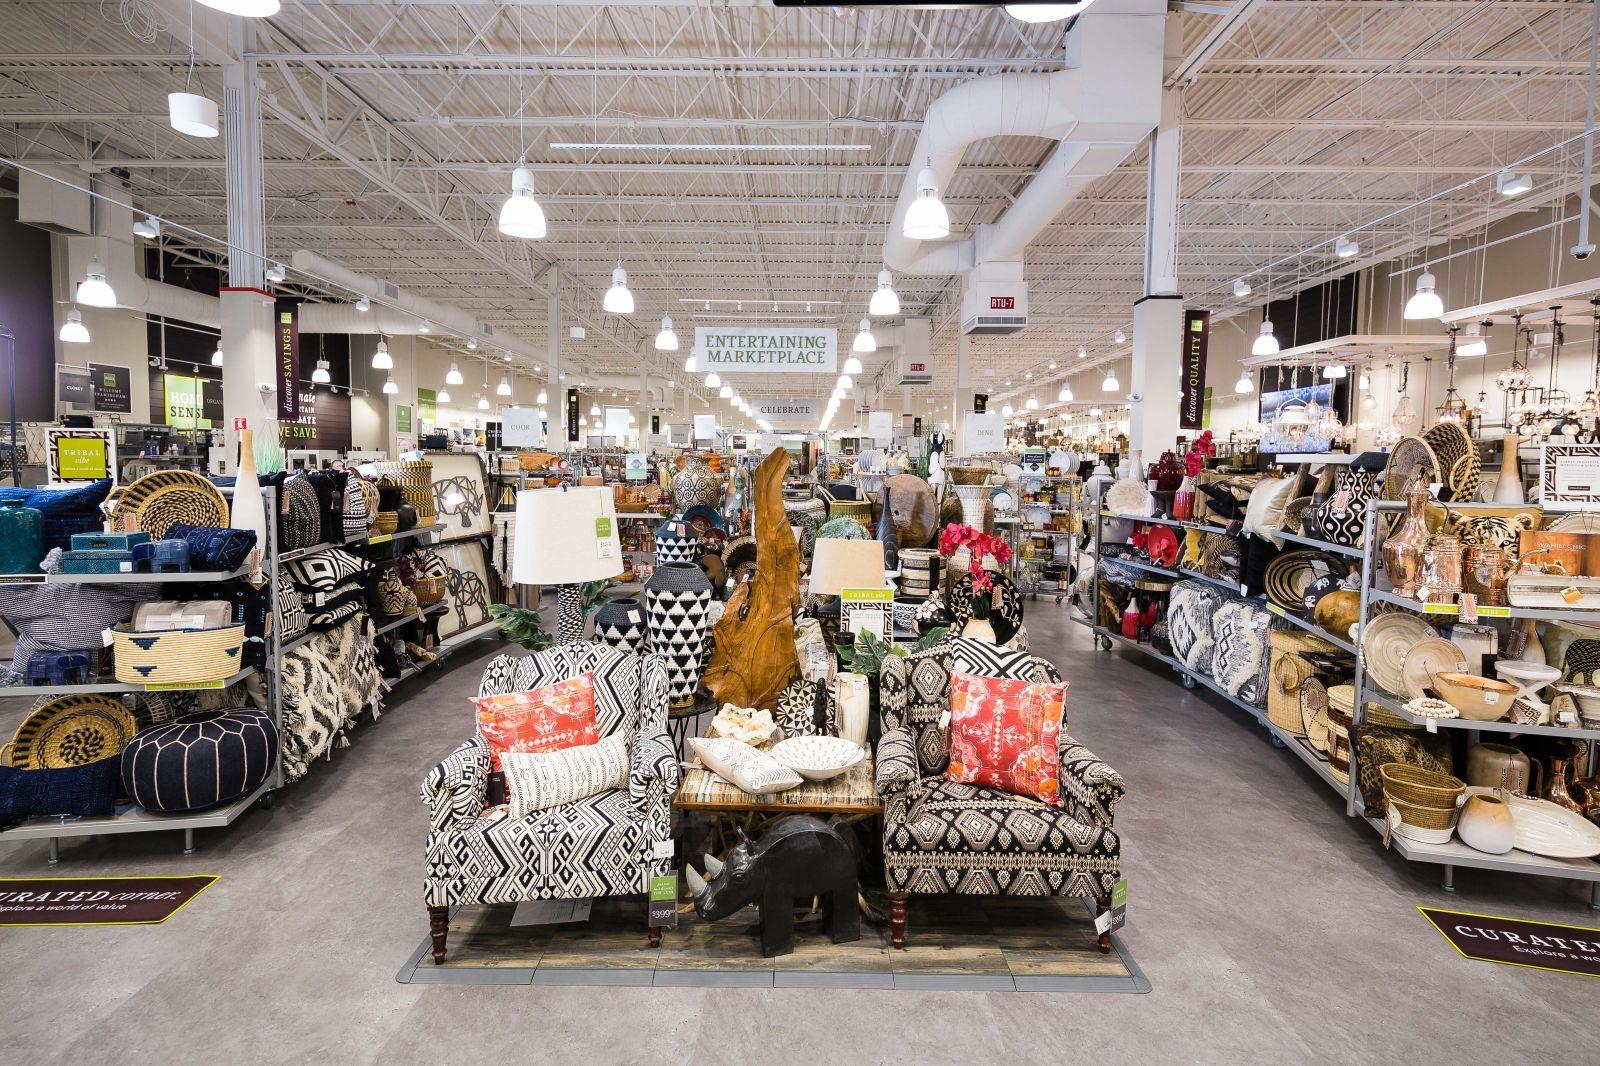 49++ Homesense stores in nj information